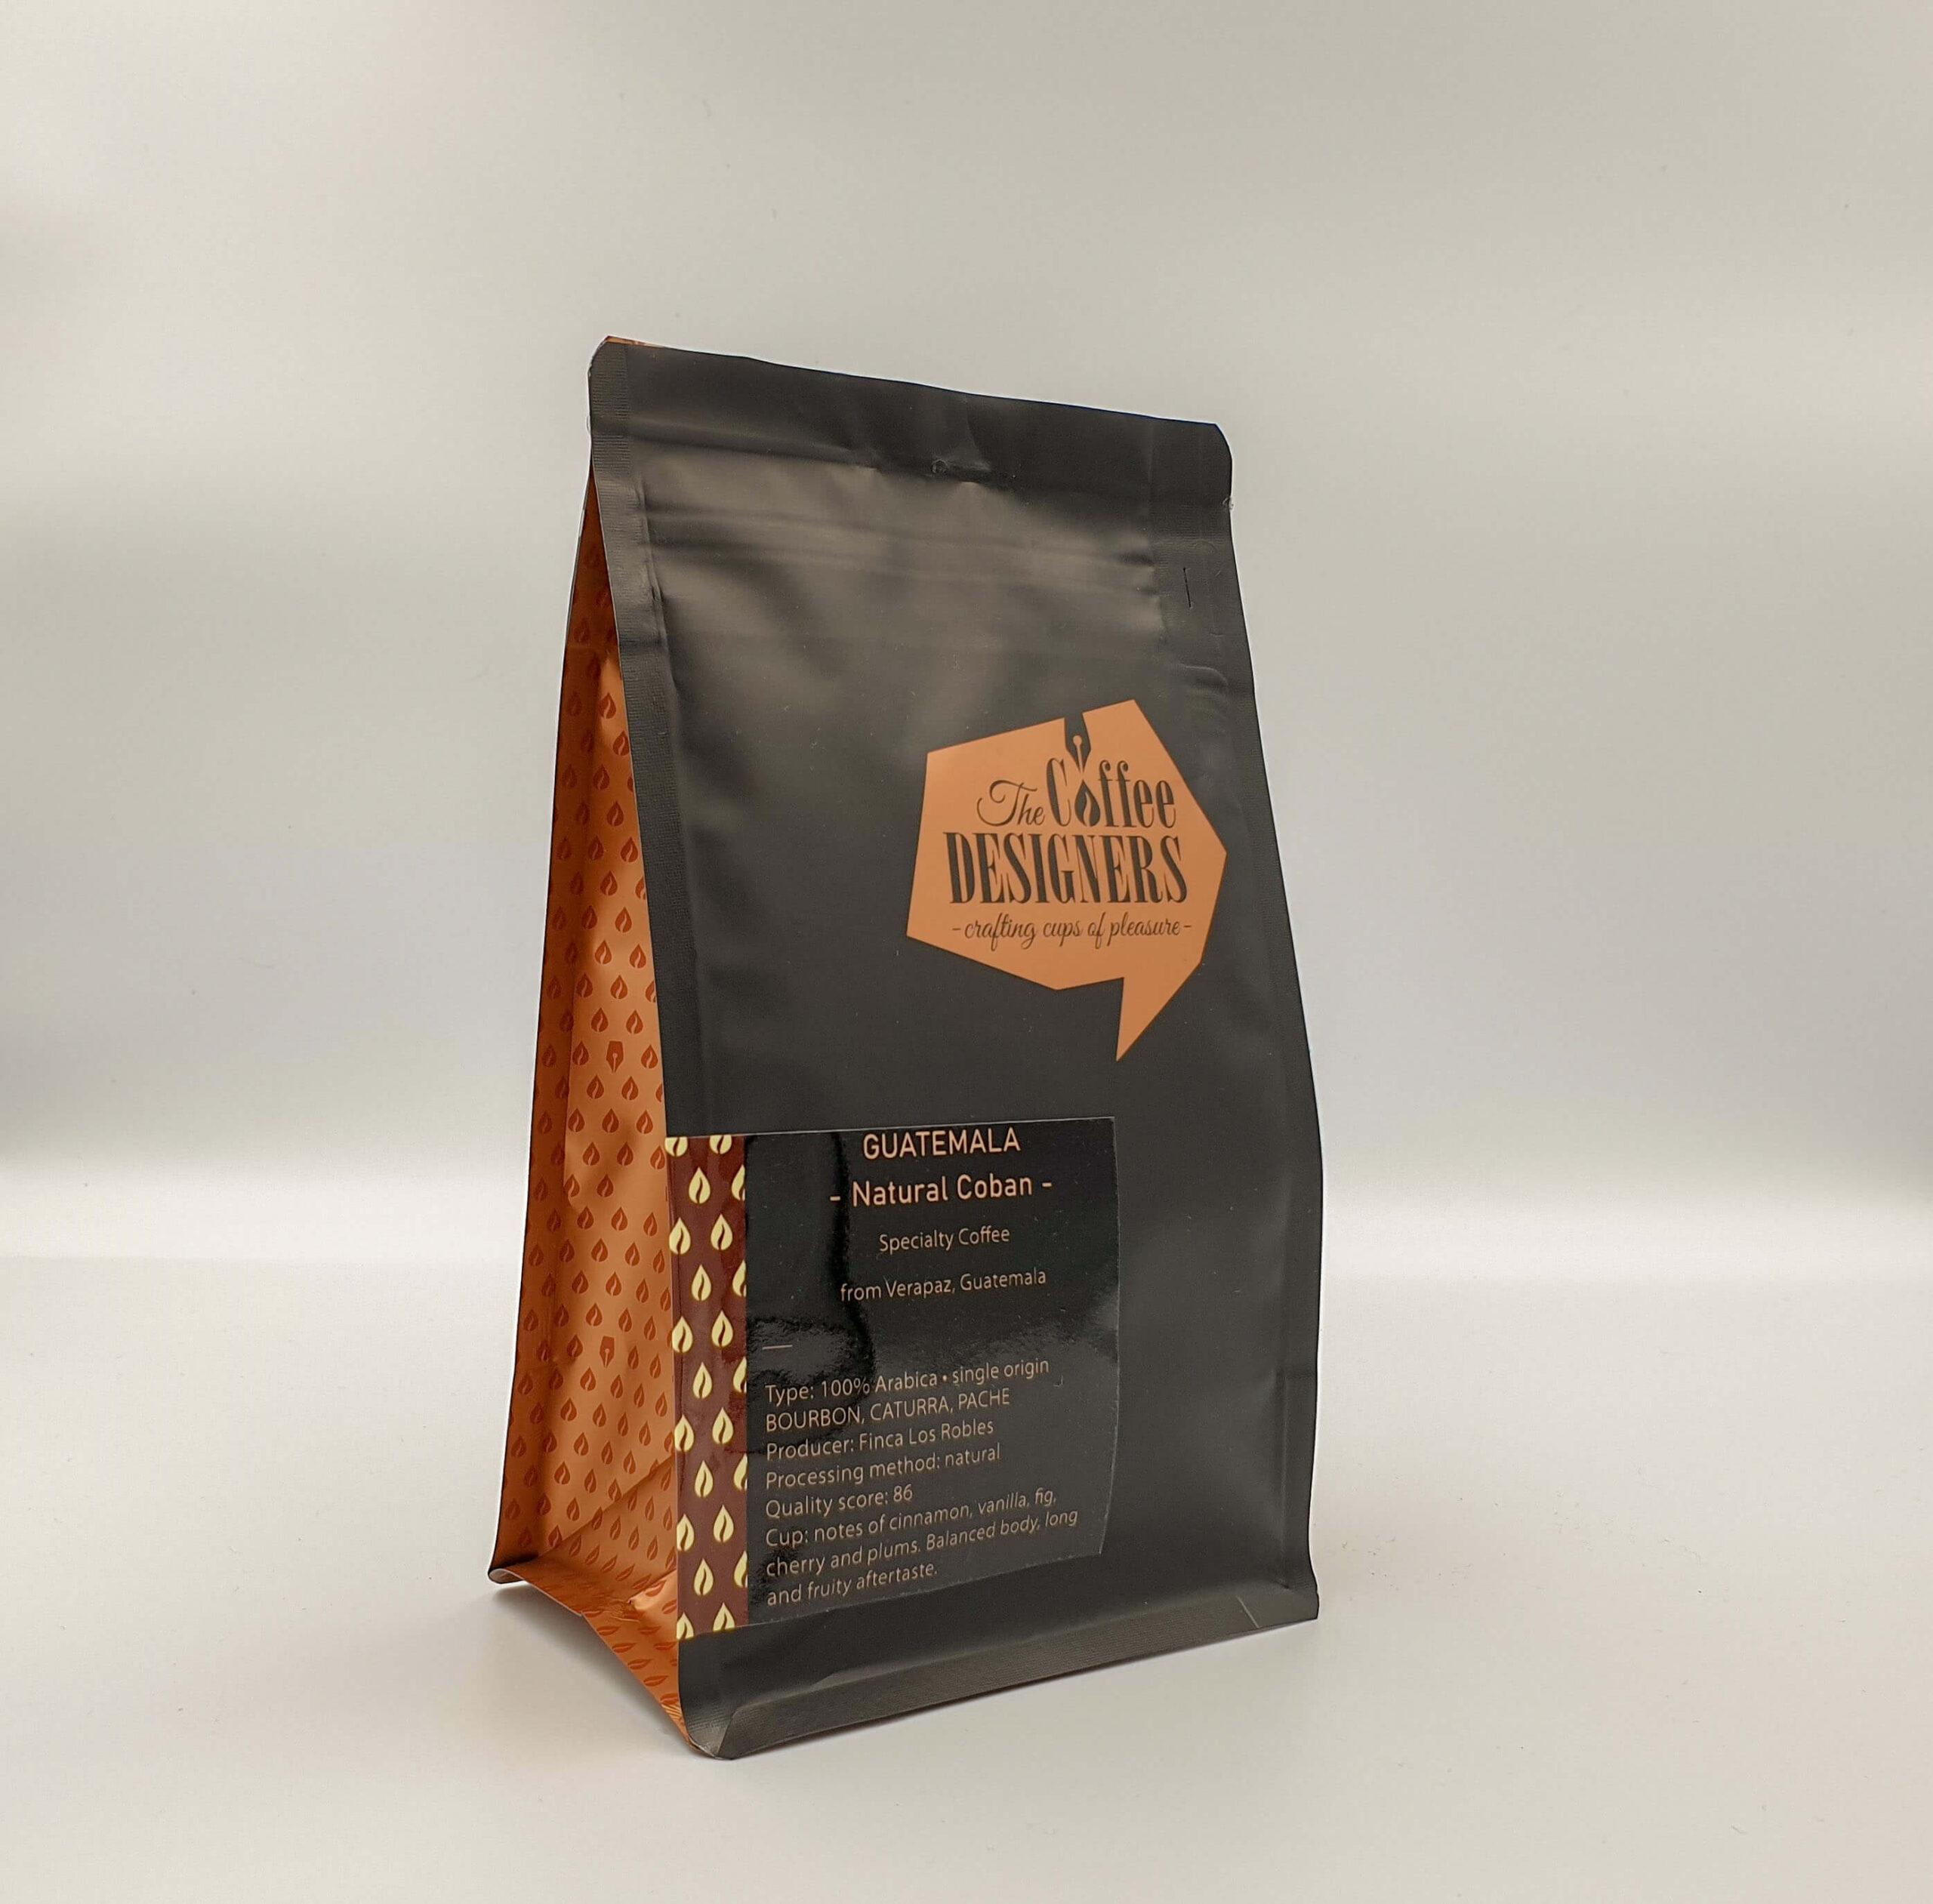 Cafea de specialitate_Guatemala Natural Coban_Coffee Designers